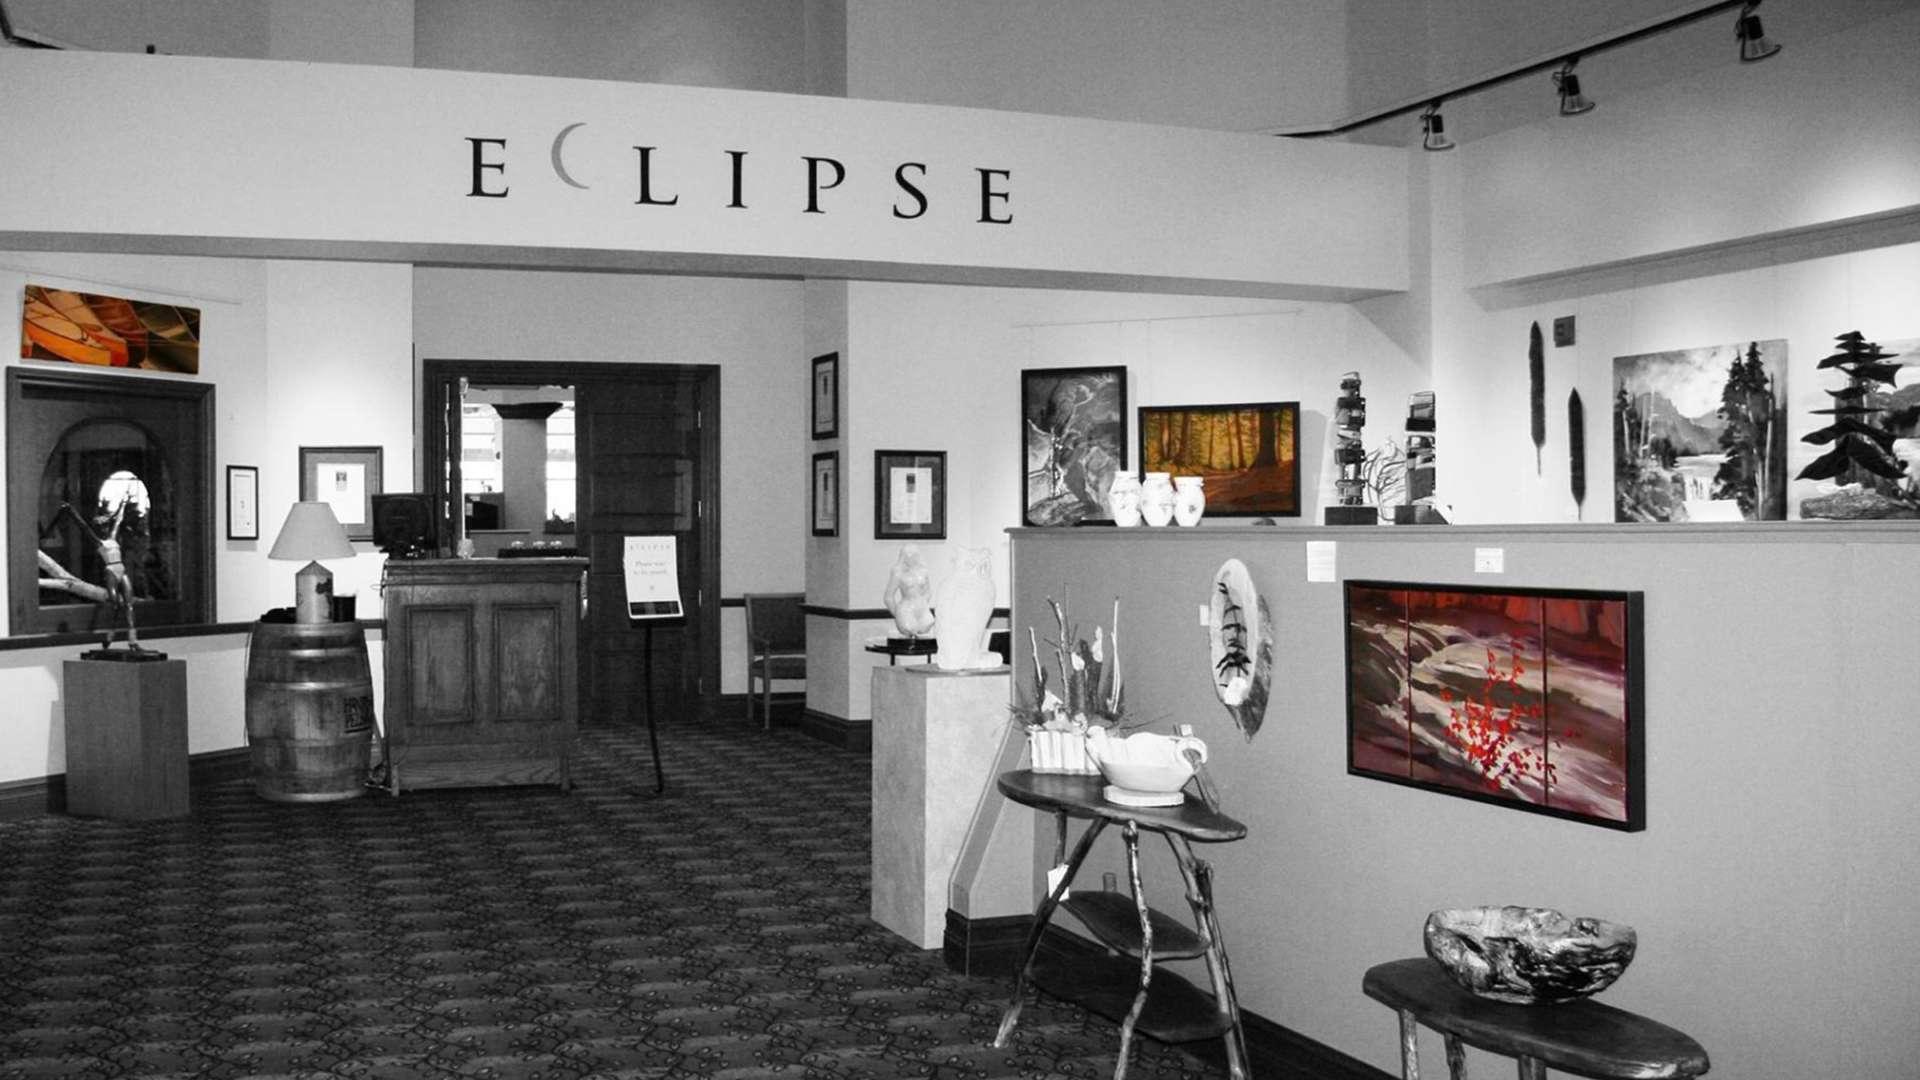 Eclipse Art Gallery